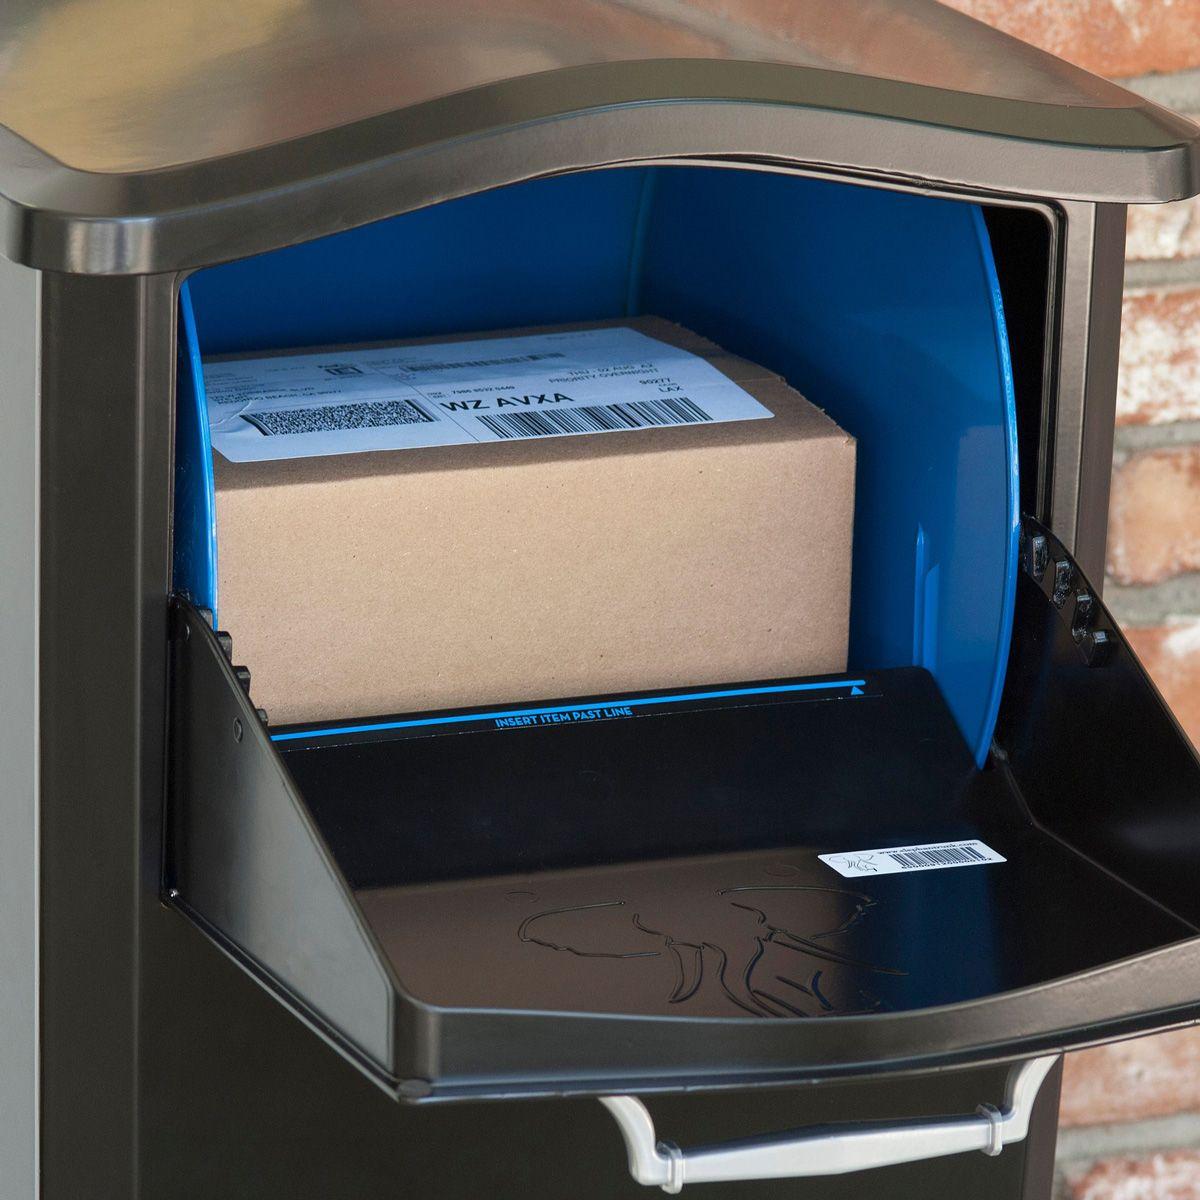 Elephantrunk Home Parcel Drop Box